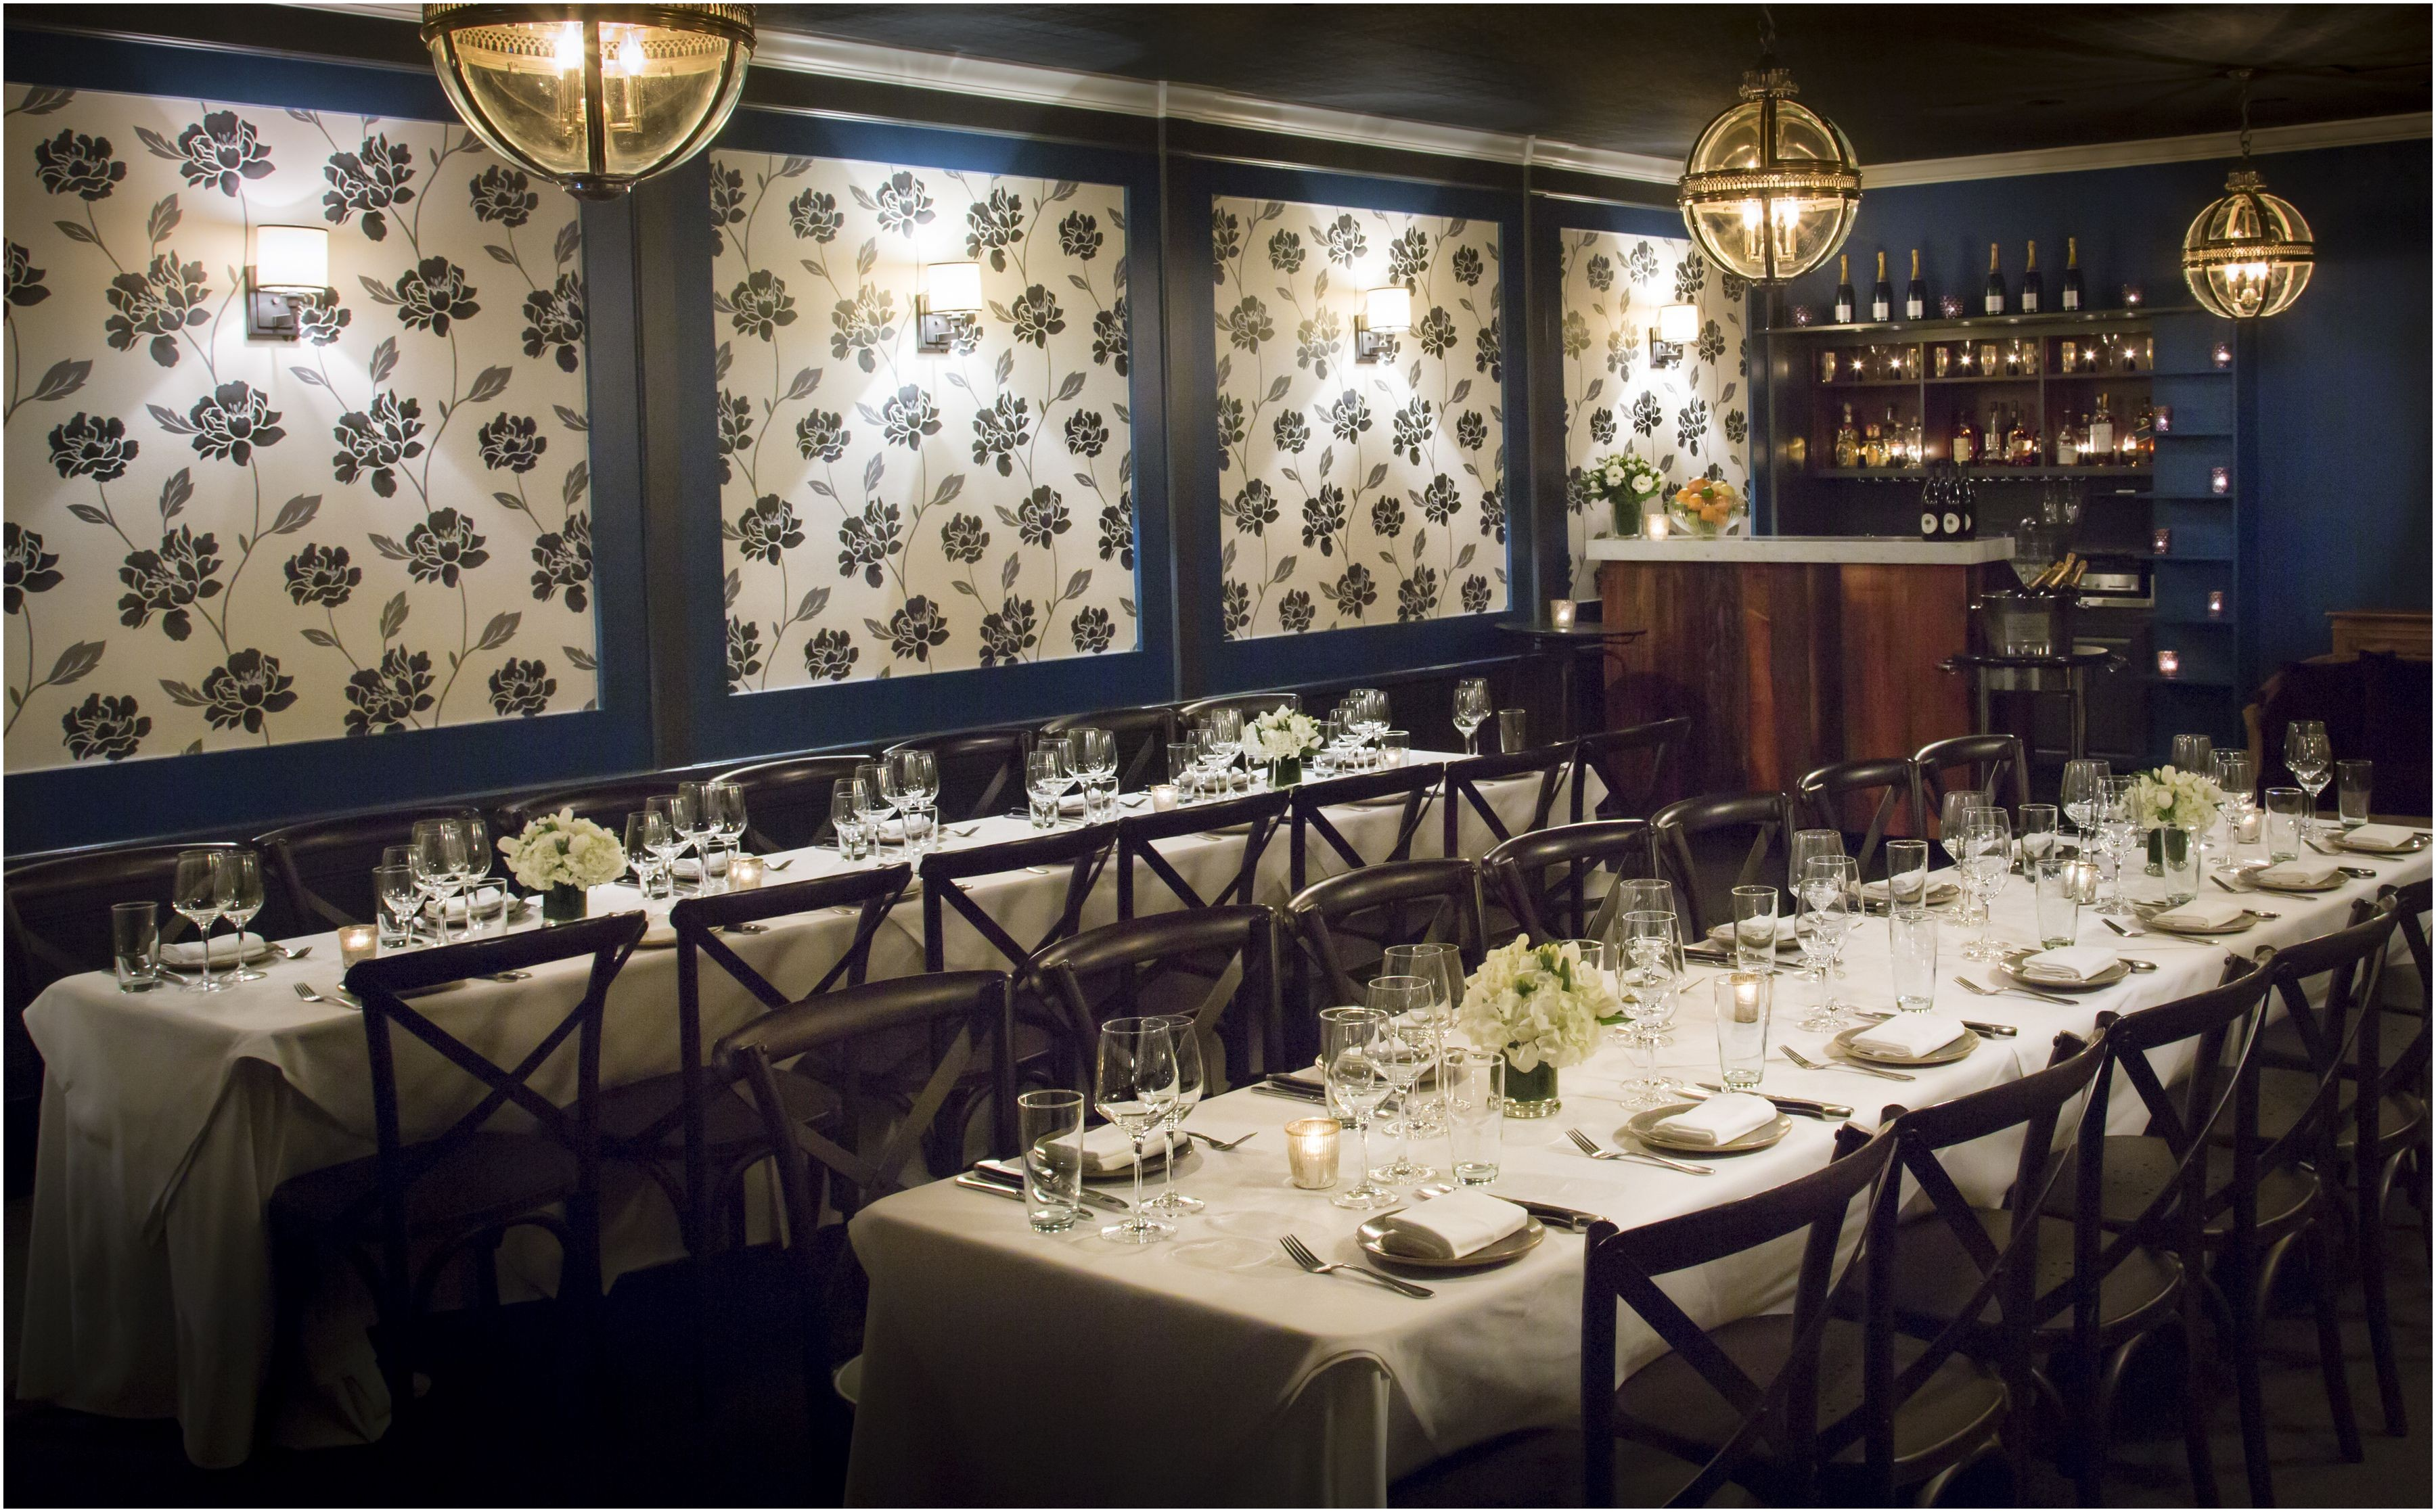 Best Italian Restaurants Near north Beach San Francisco Best Of the Eden Rm Park Tavern Restaurant northbeach Can Ac Modate 50